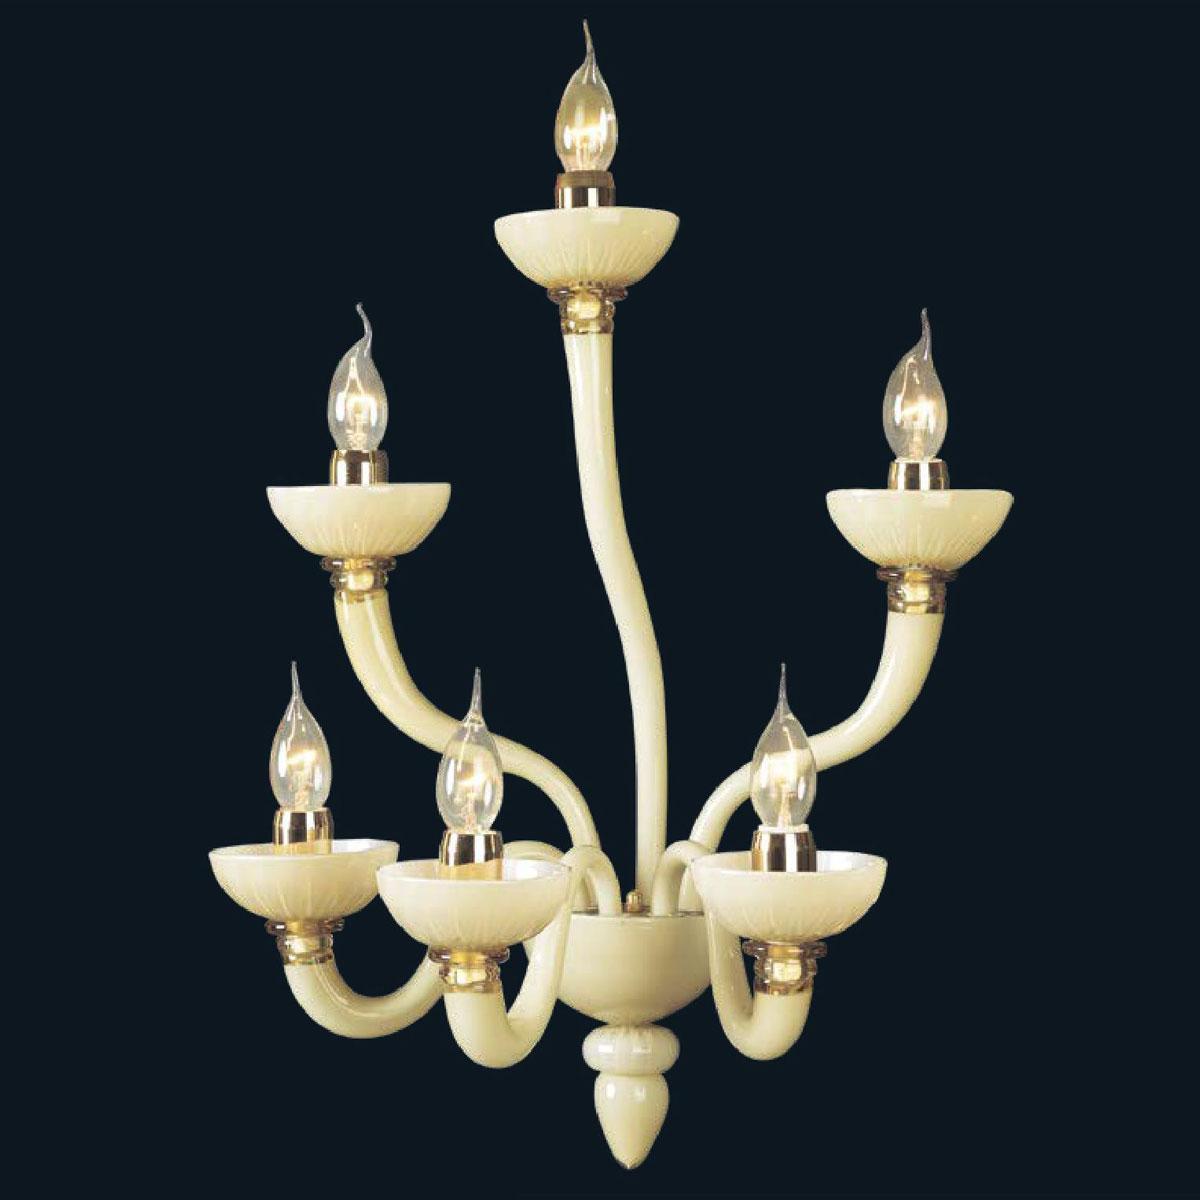 """Fateh"" Murano glass sconce - 3+2+1 lights - white"